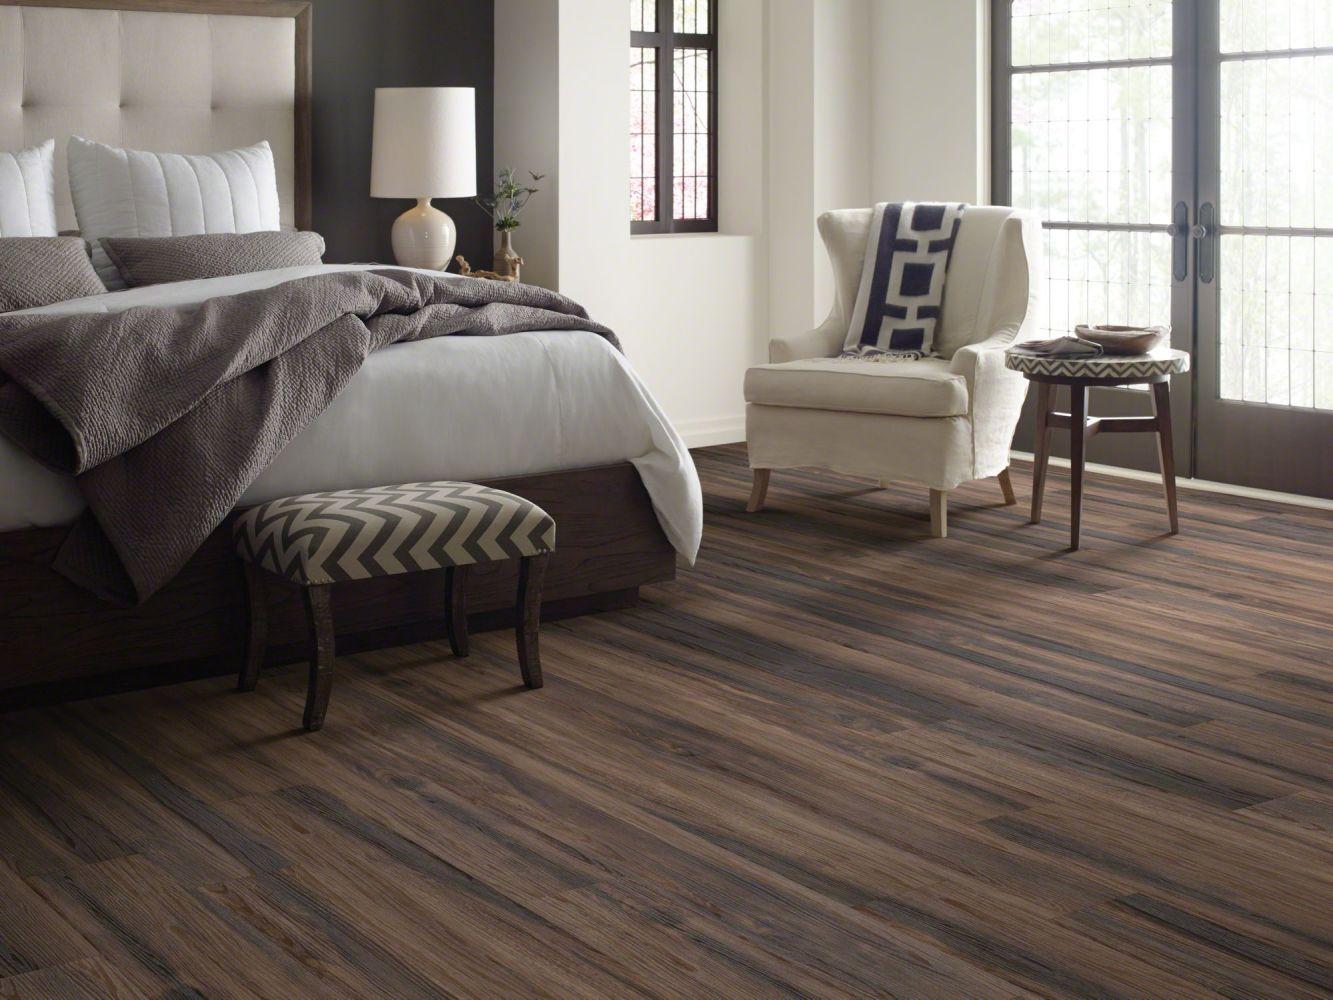 Shaw Floors Resilient Residential Alto Plus Plank Nocciola 00702_2576V